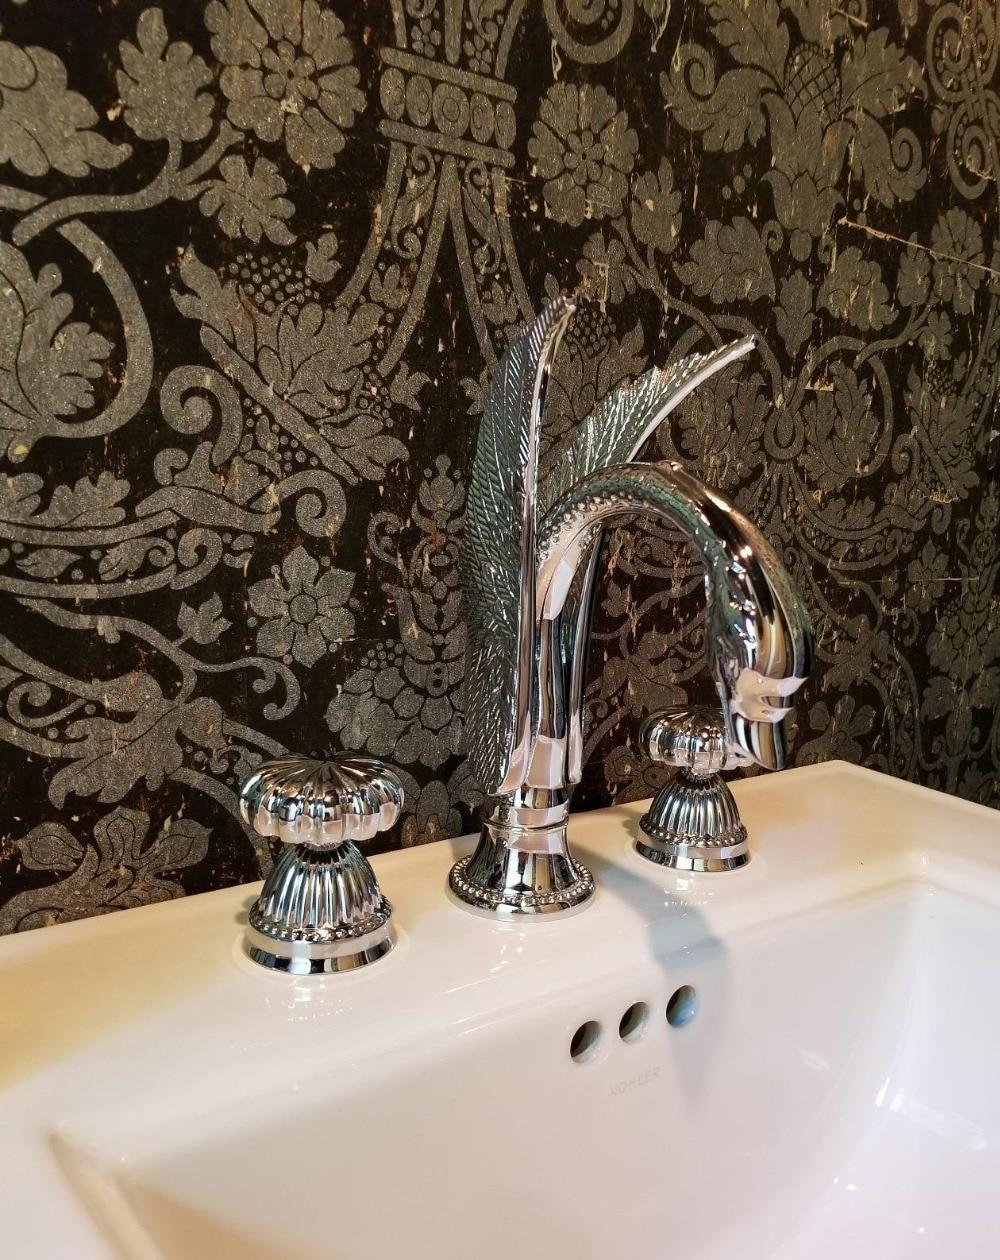 Free Ship Chrome Colour Pieces Bathroom Swan Sink Faucet - 3 piece bathroom sink faucet